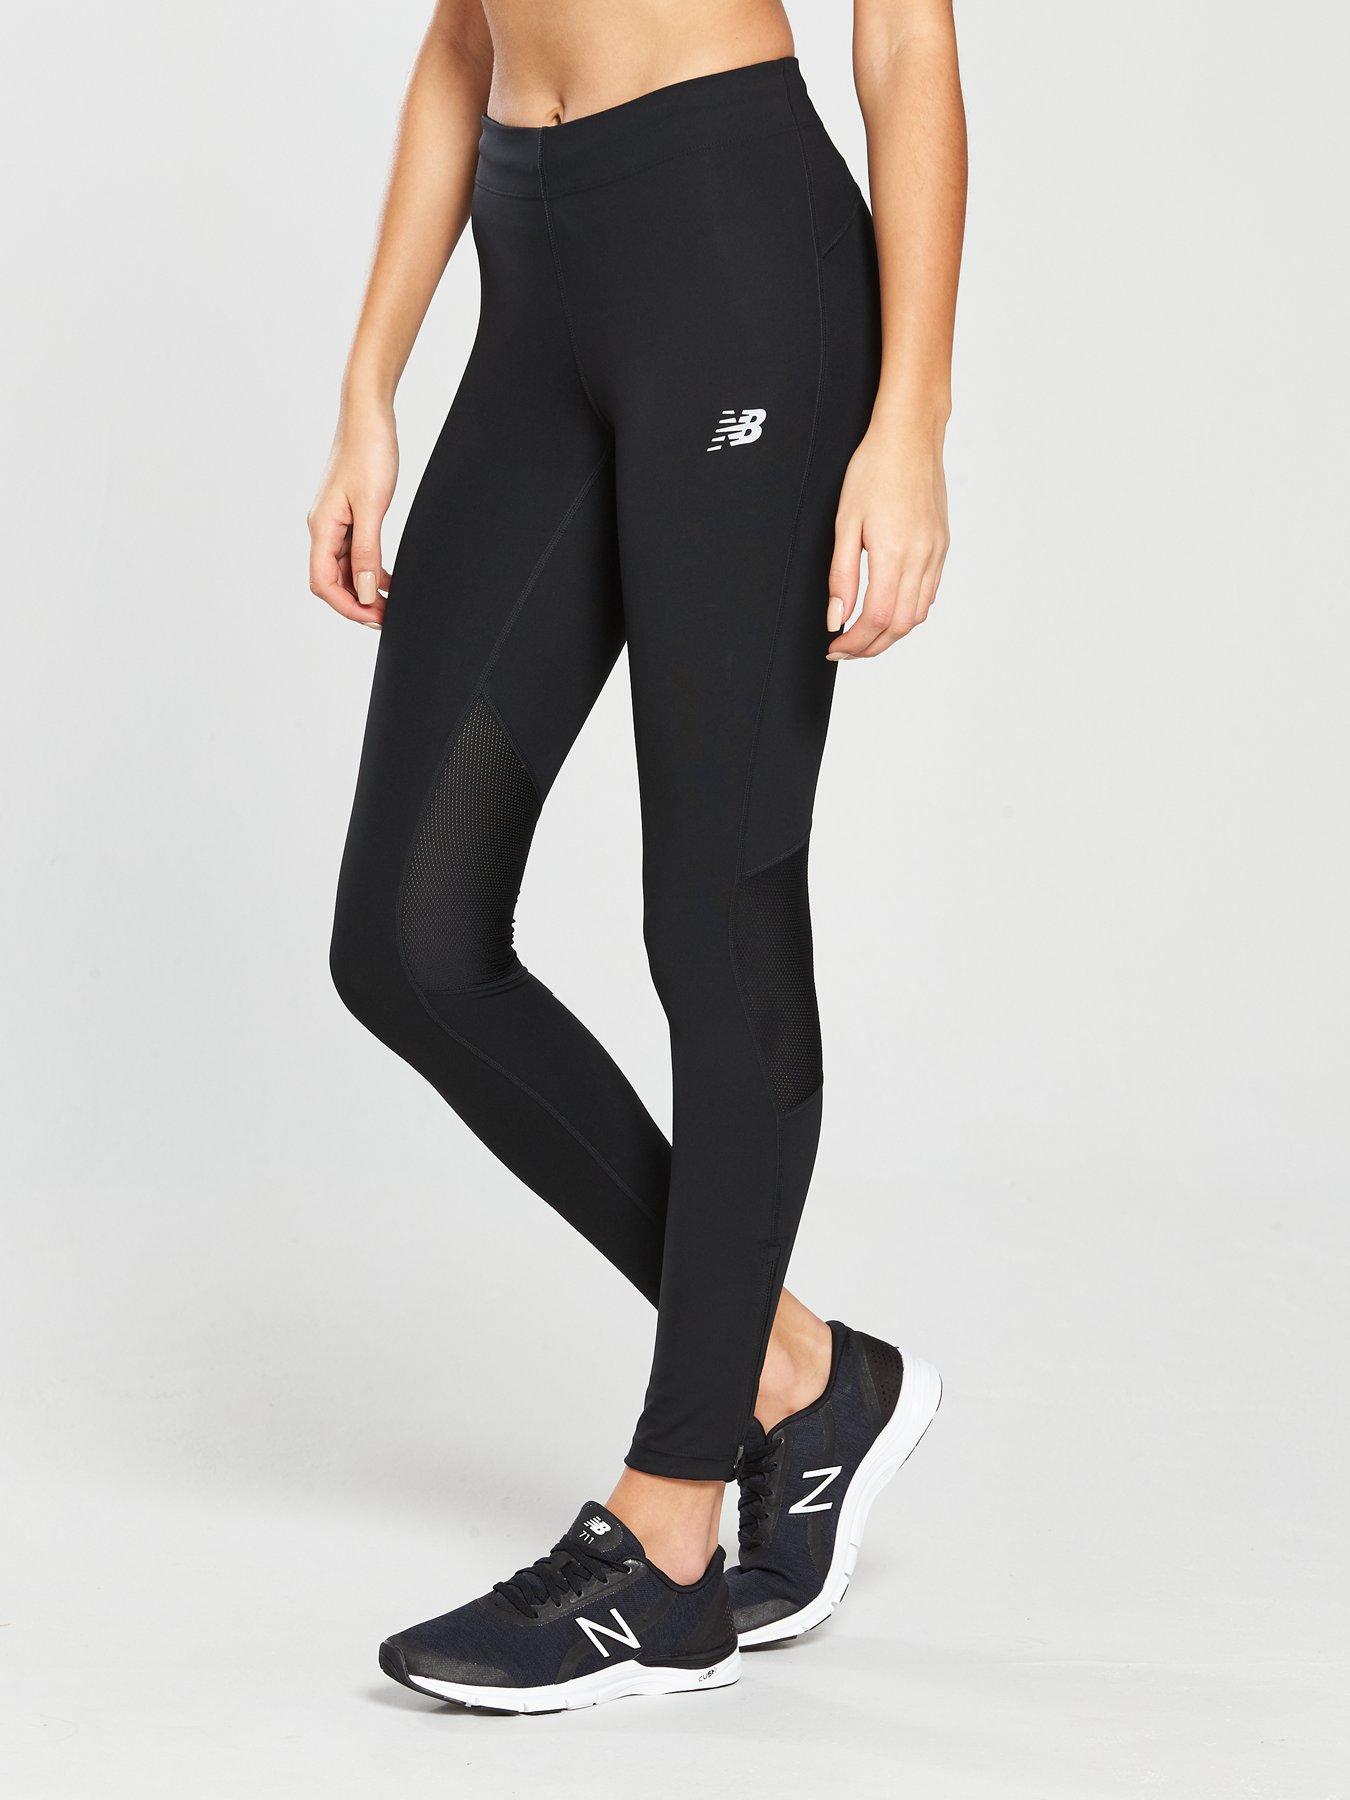 new balance leggings women